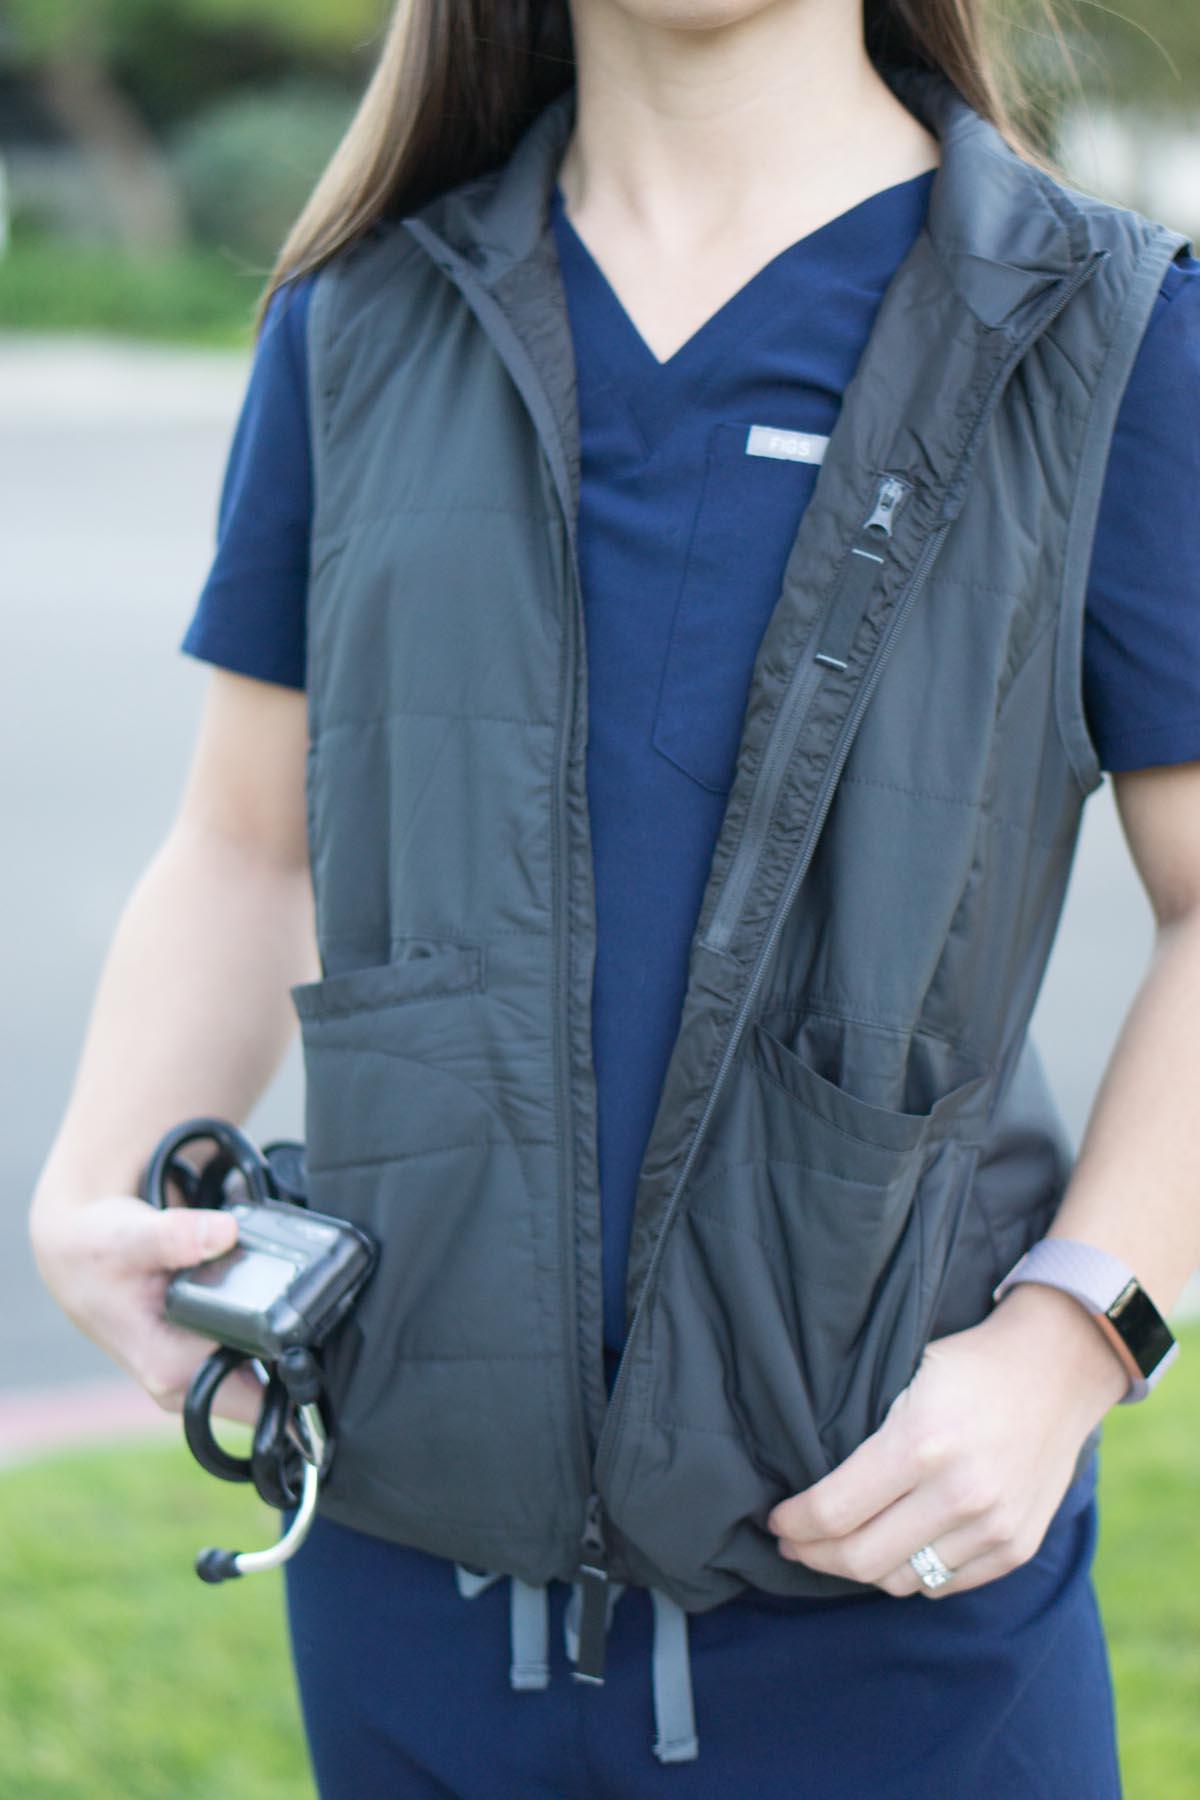 FIGS Scrubs | Fleece, Tee, Vest Review | Women & Men ...